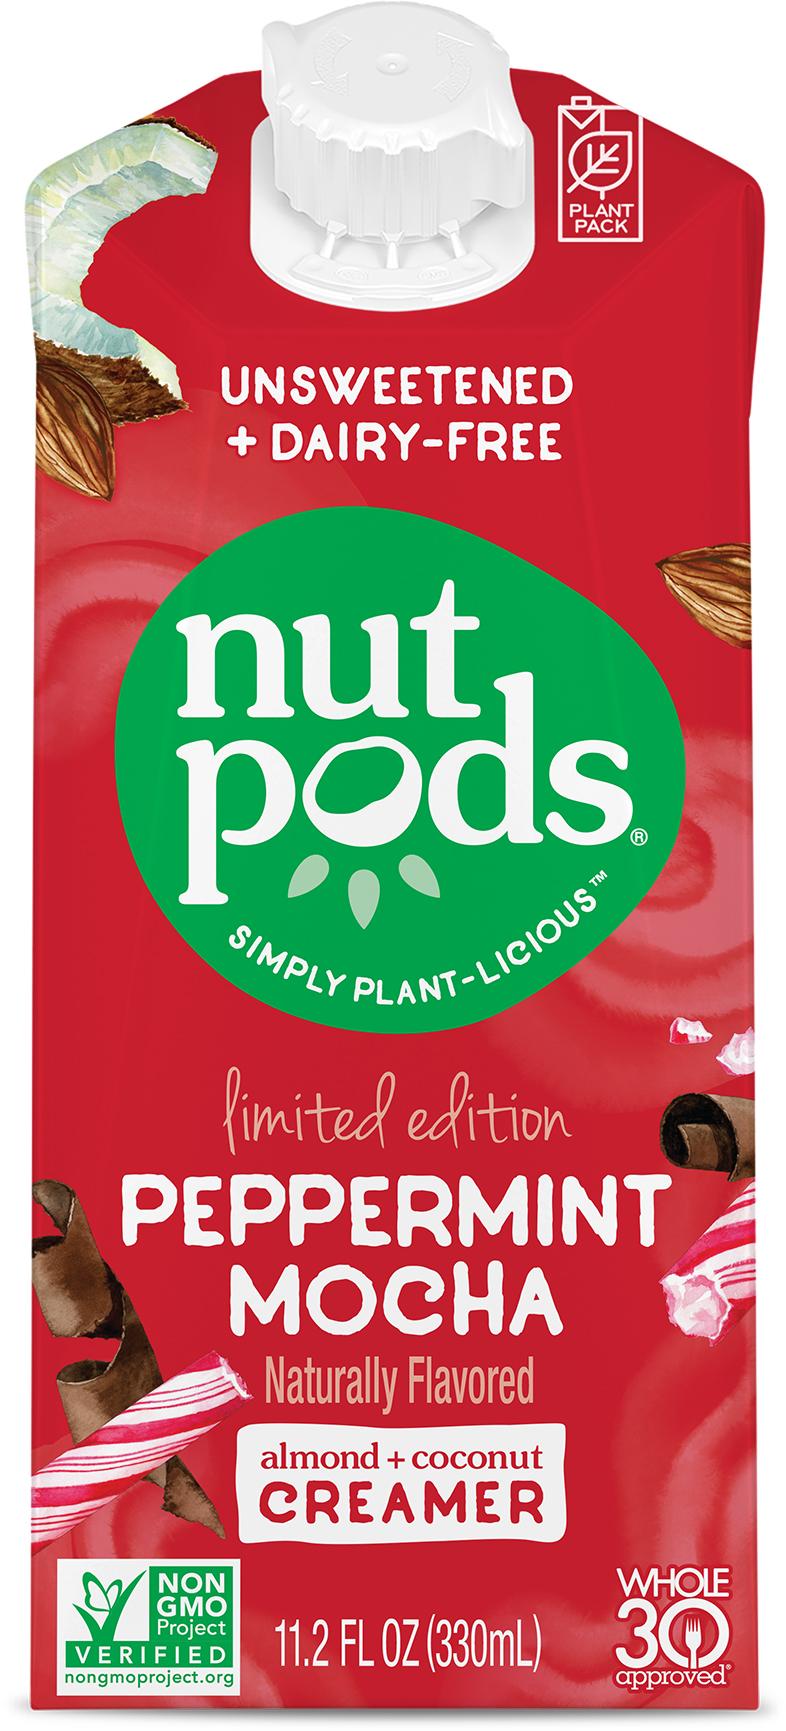 Peppermint Mocha dairy-free creamer